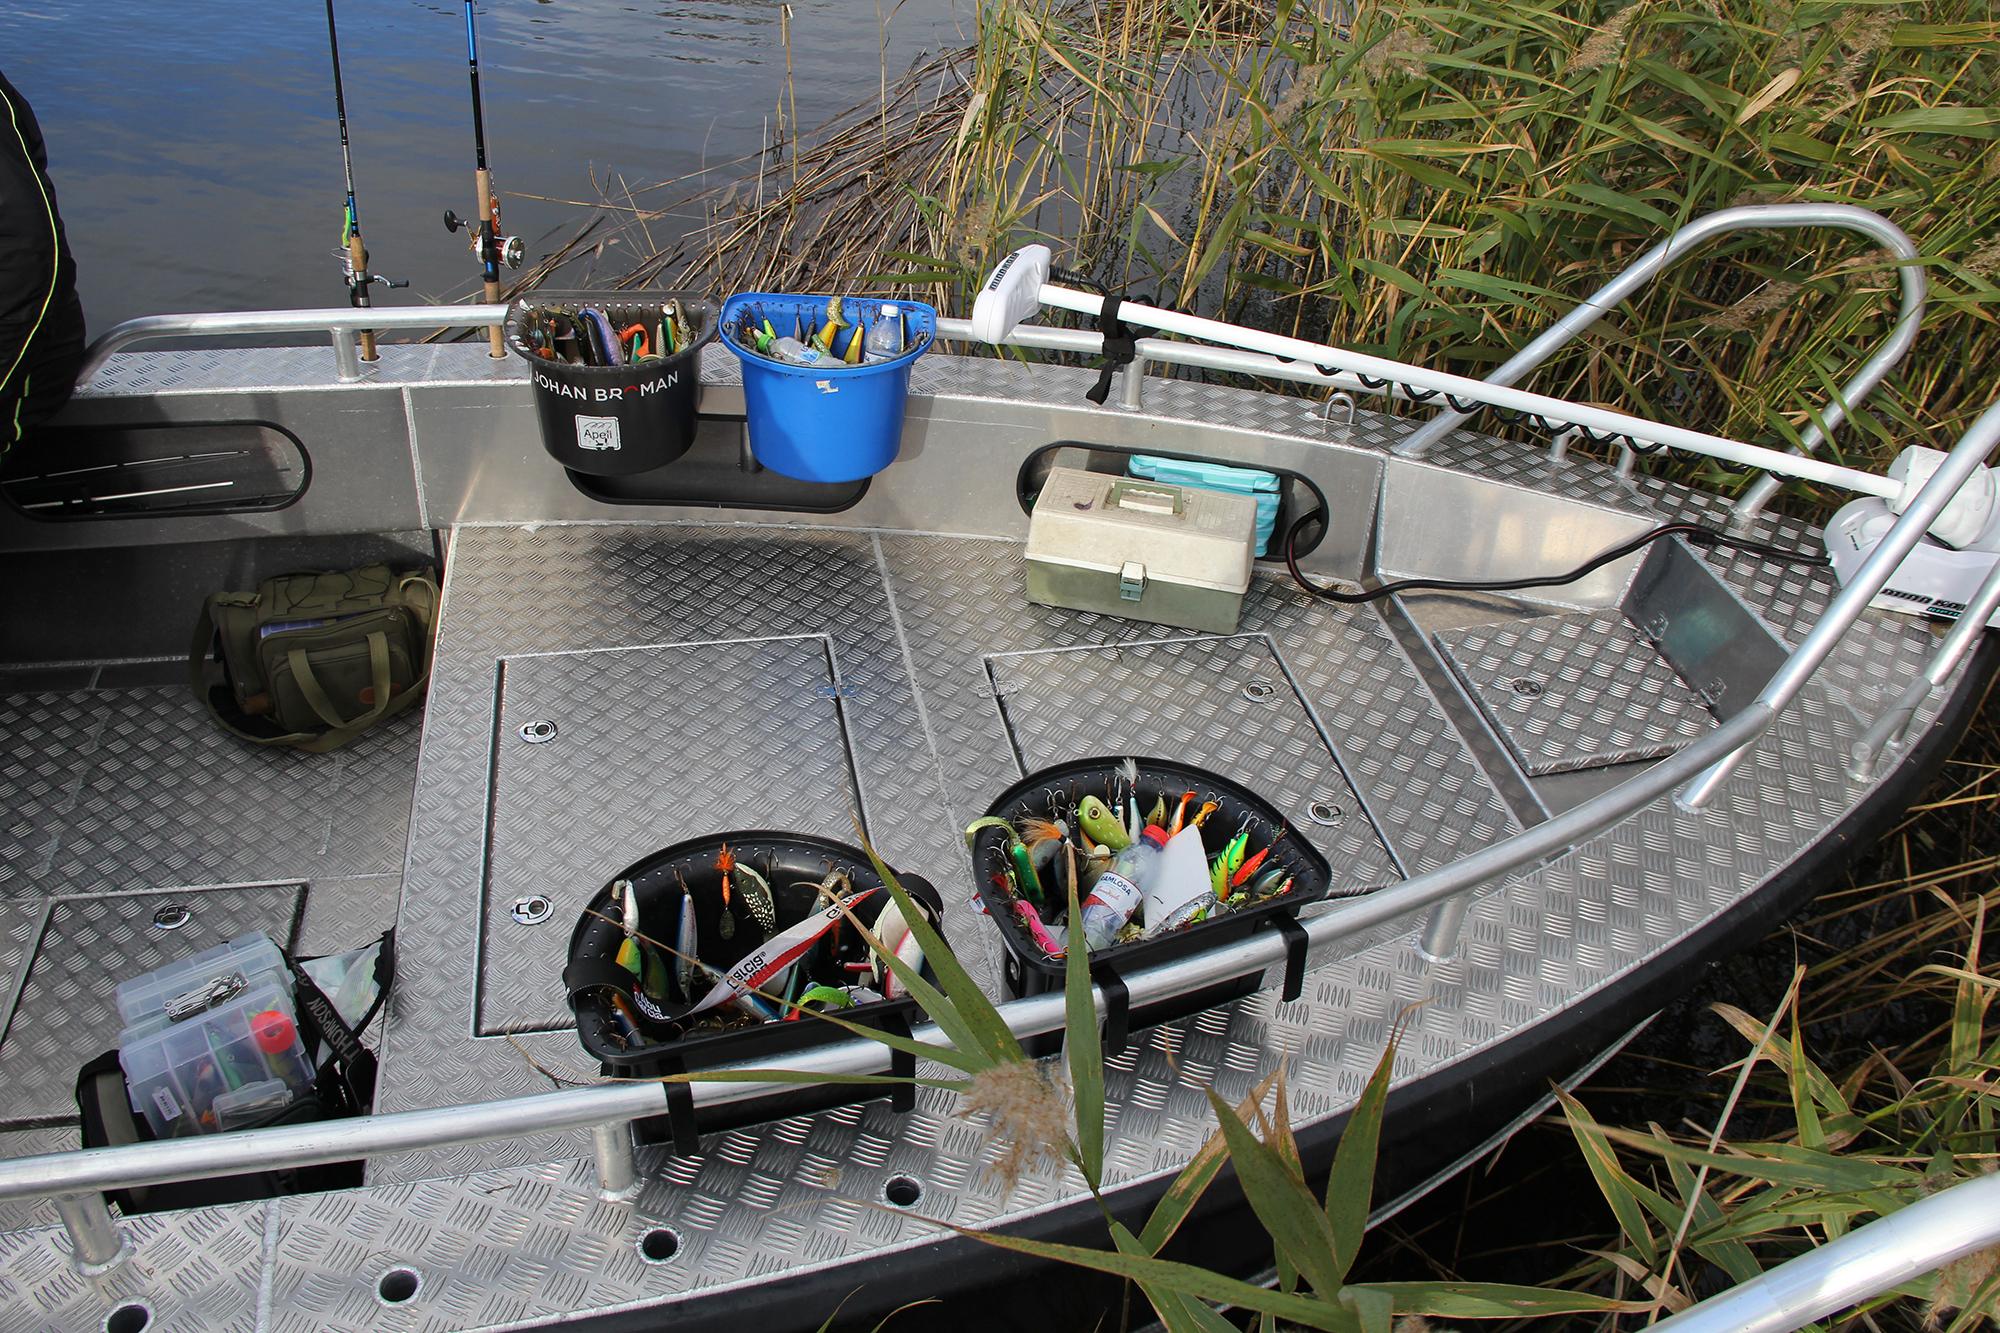 Bra fiskebåt aluminium